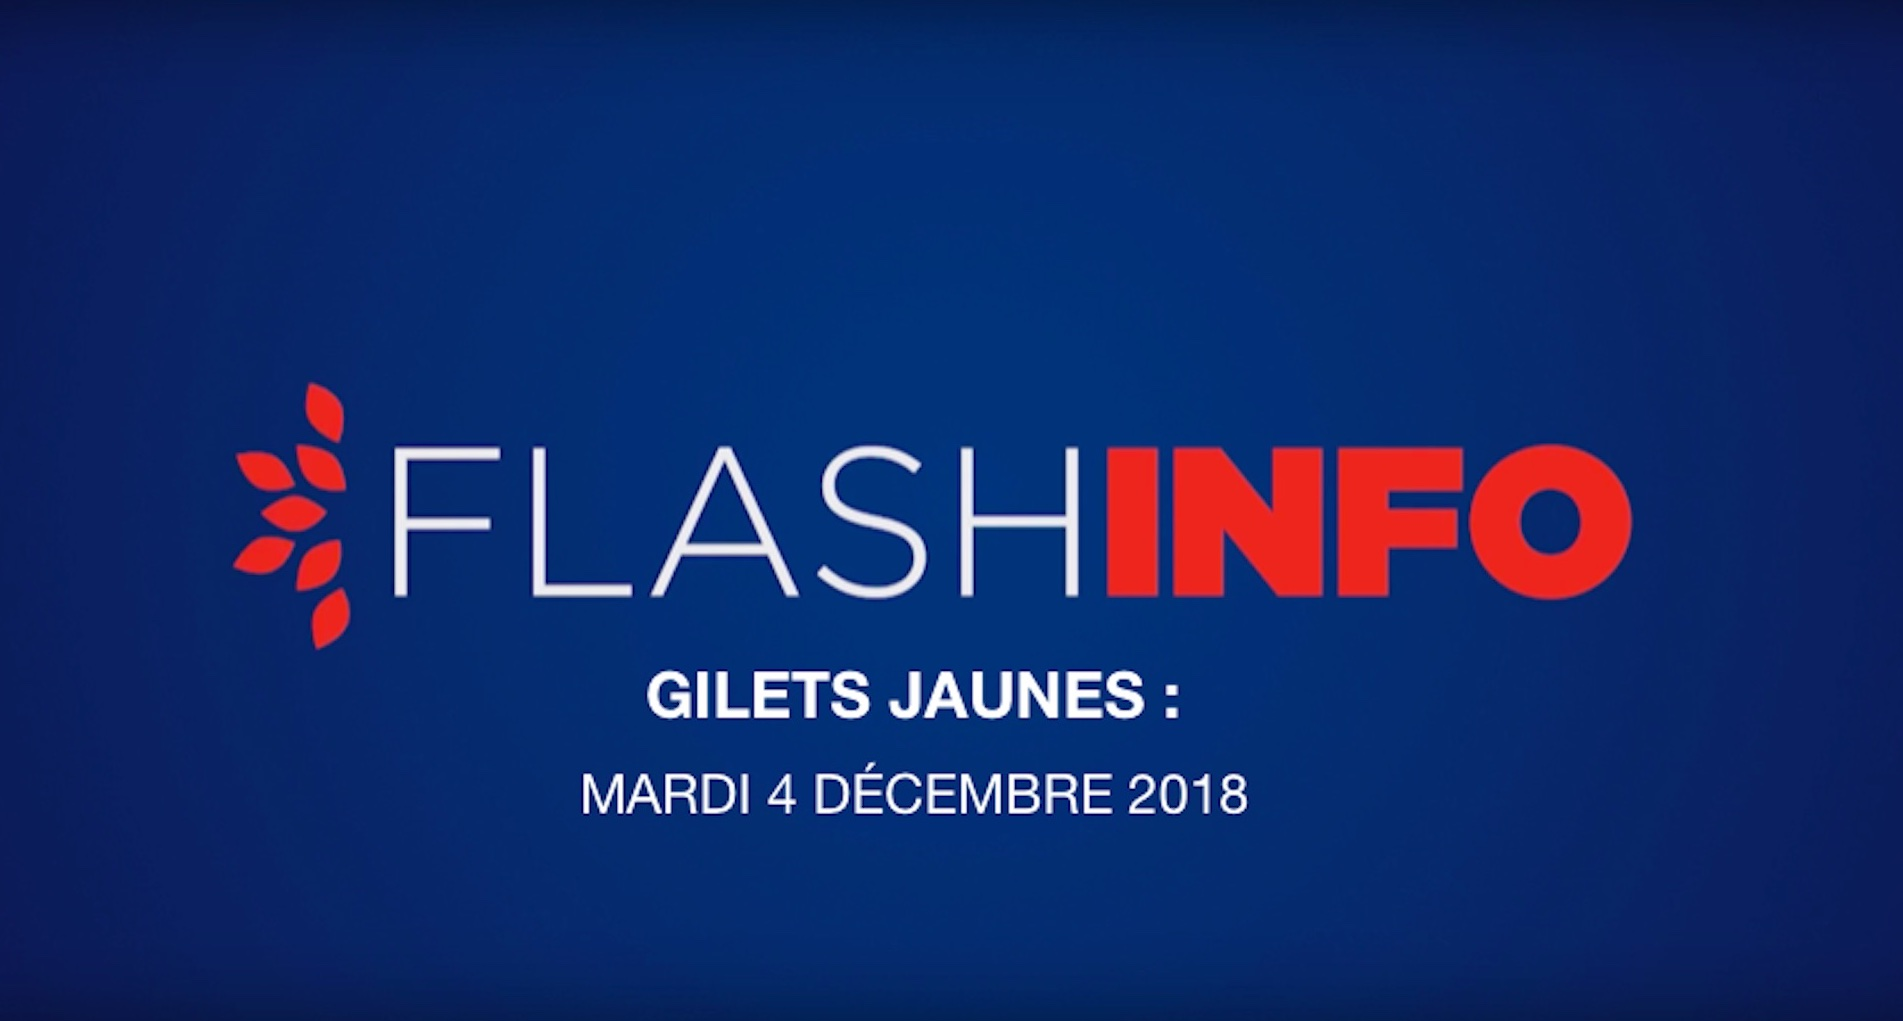 Flash info 041218